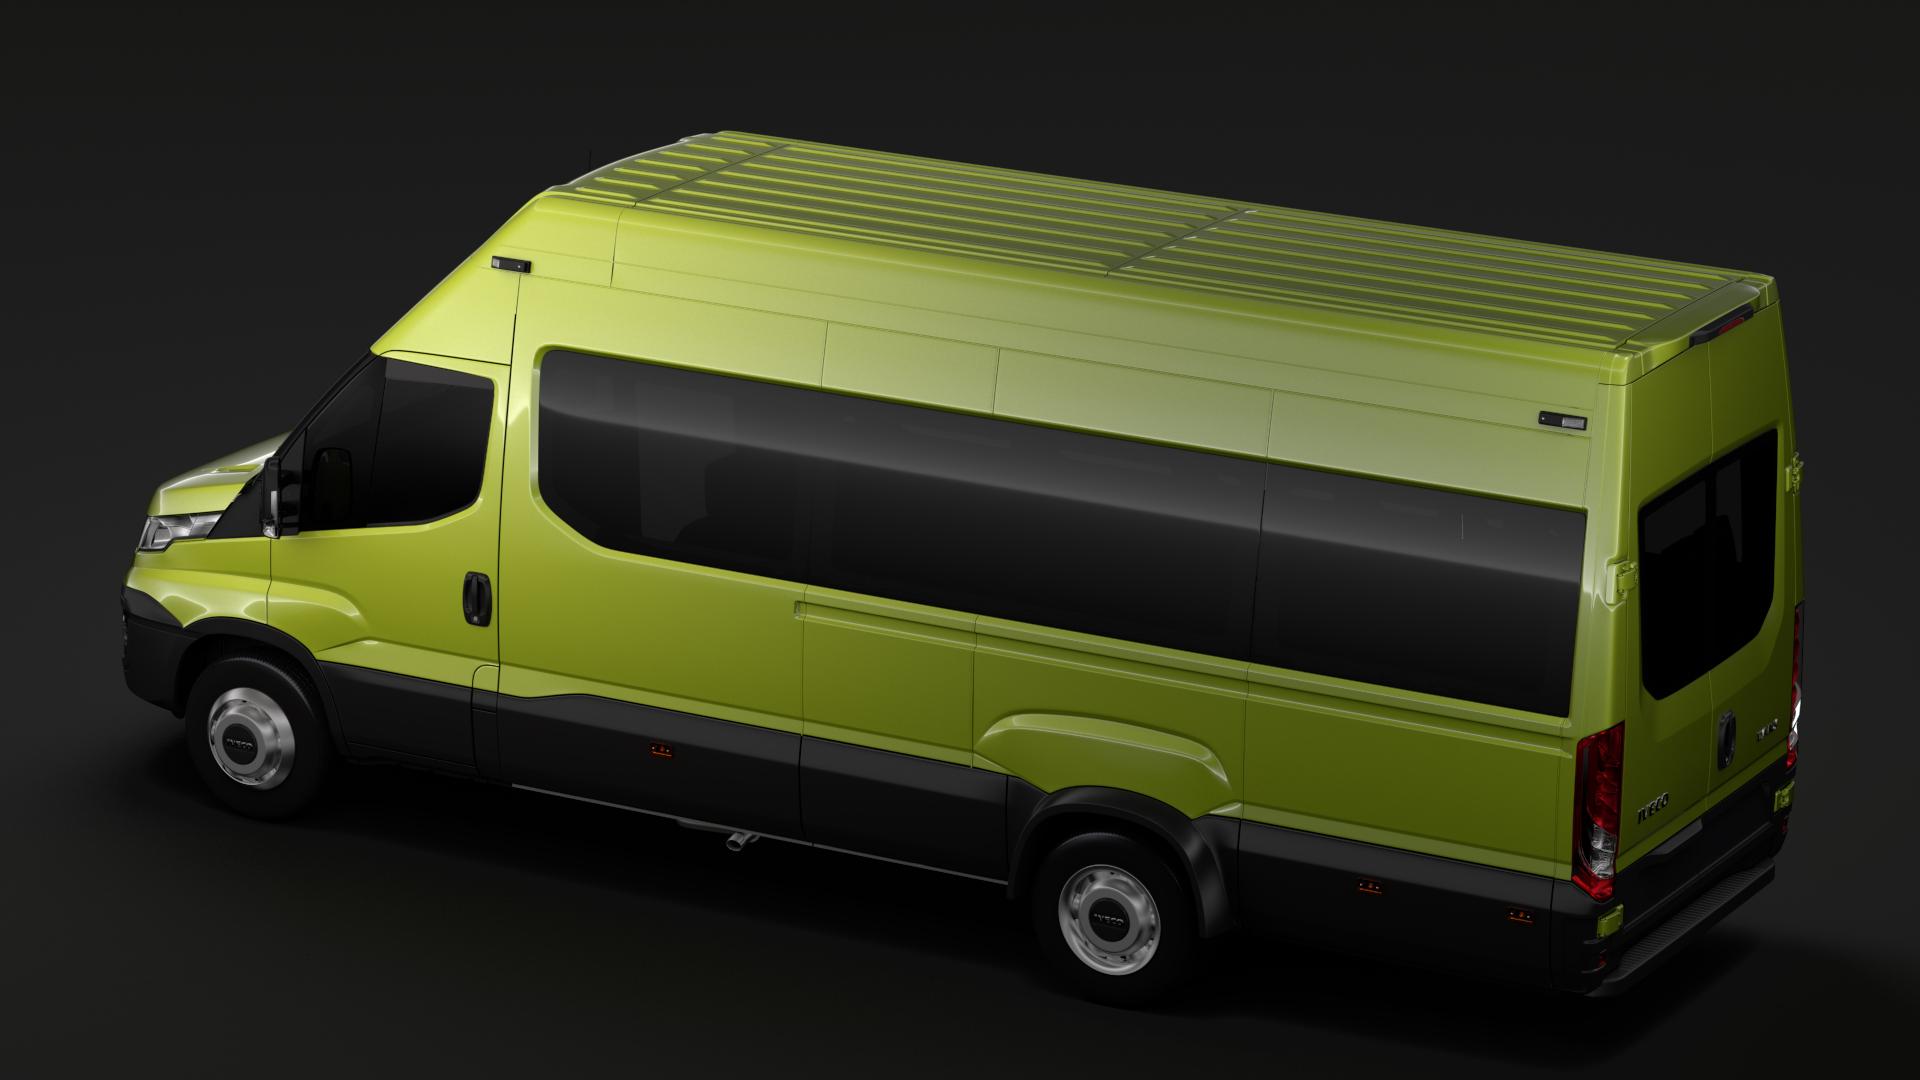 iveco daily tourus l4h3 2014-2016 3d model max fbx c4d lwo ma mb hrc xsi obj 276234